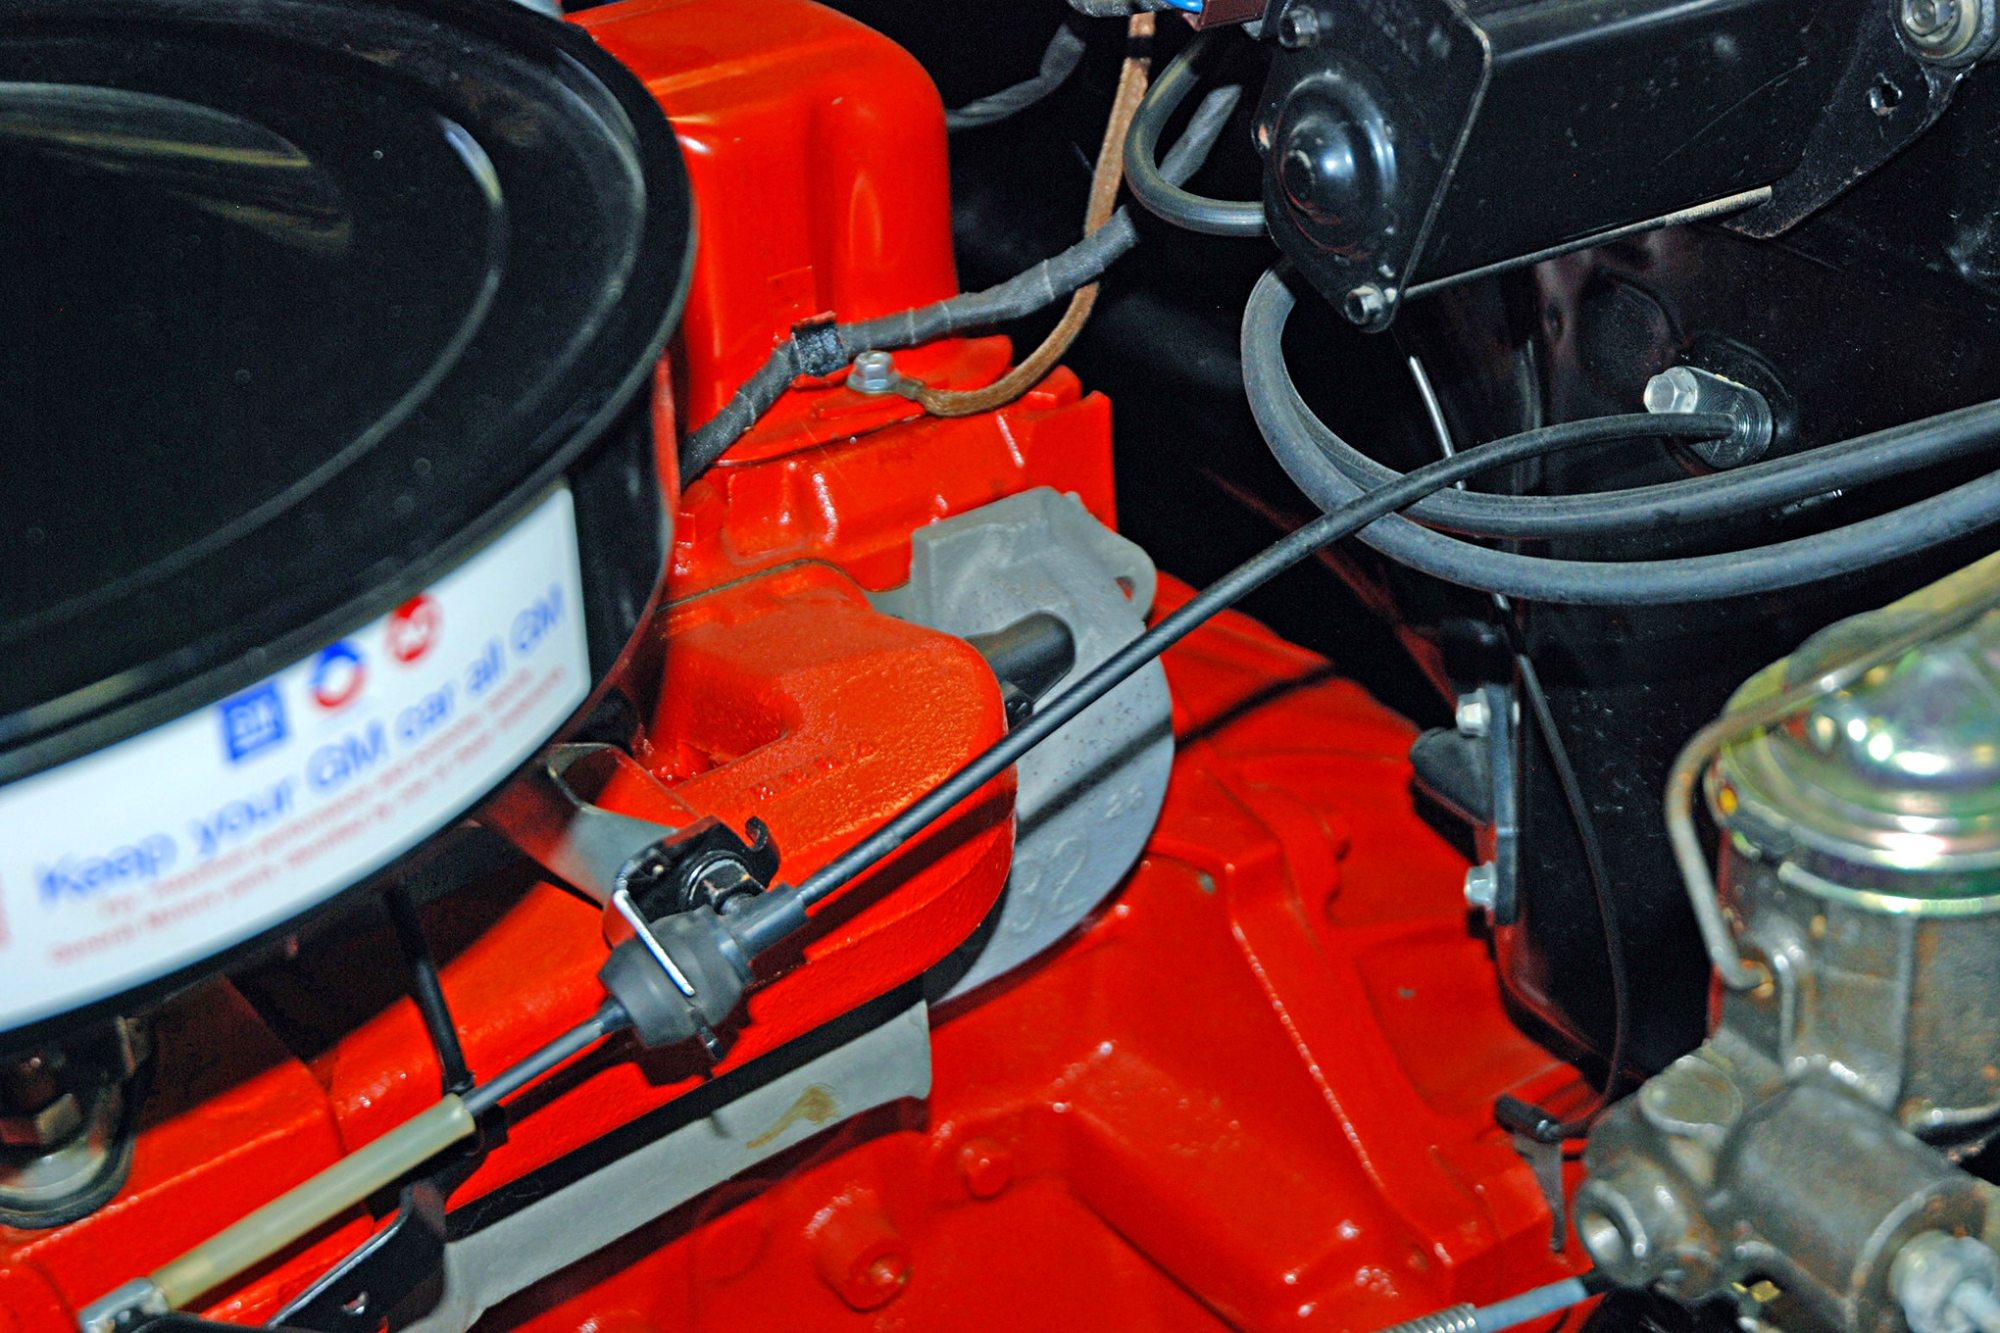 hight resolution of 1972 nova engine diagram wiring diagram 1972 chevy nova engine wiring harness diagram 1972 nova engine